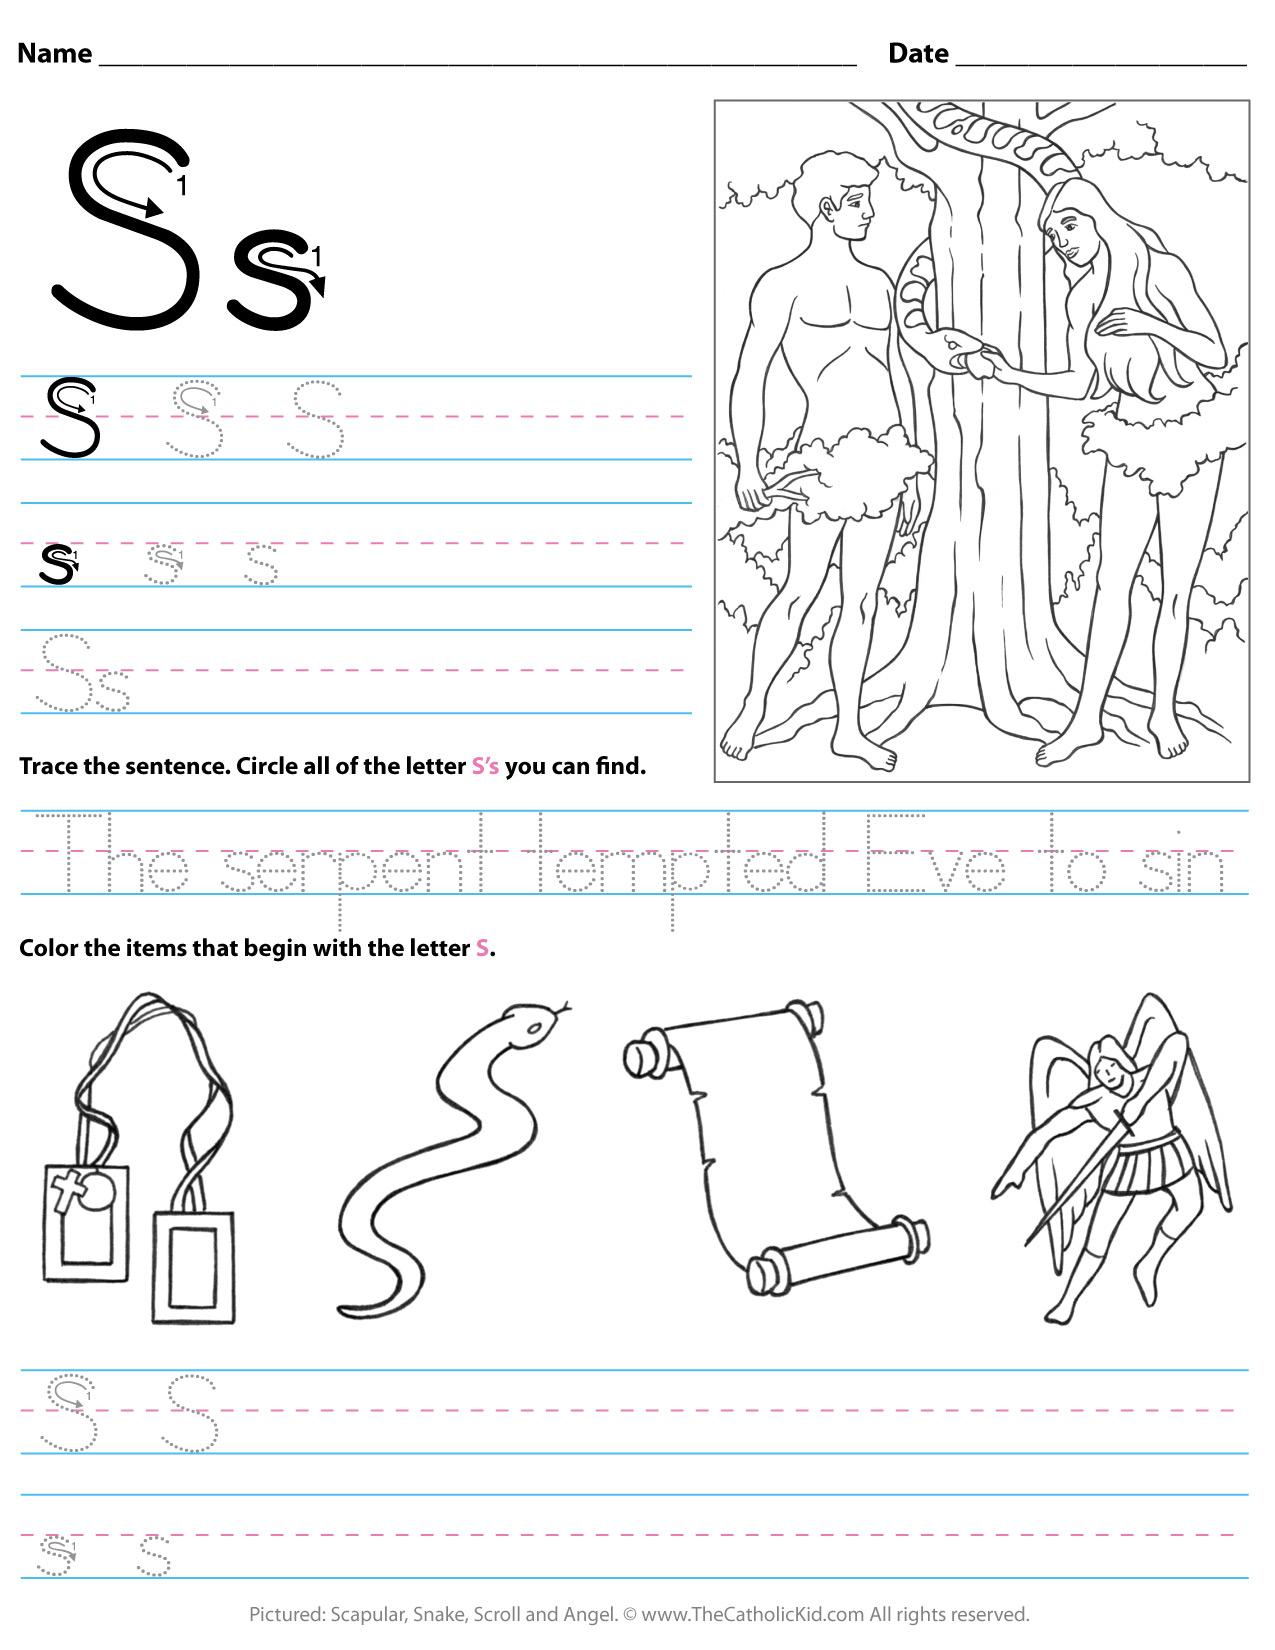 Catholic Alphabet Letter S Worksheet Preschool Kindergarten with regard to Letter Ii Worksheets For Kindergarten